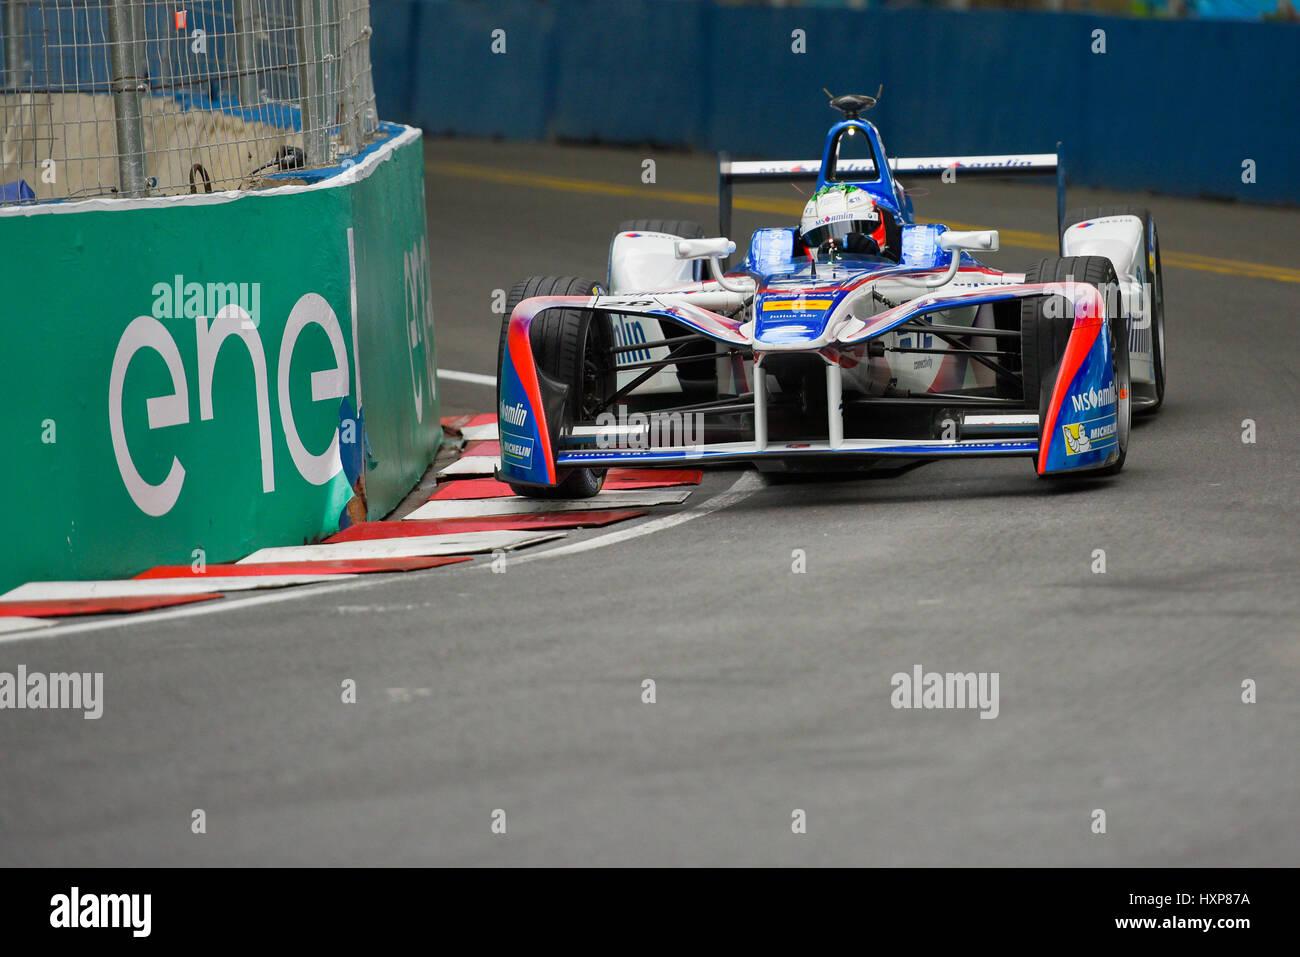 Buenos Aires, Argentinien. 18. Februar 2017. Andretti Formel E Fahrer Antonio Felix da Costa von Portugal, Praktiken Stockbild